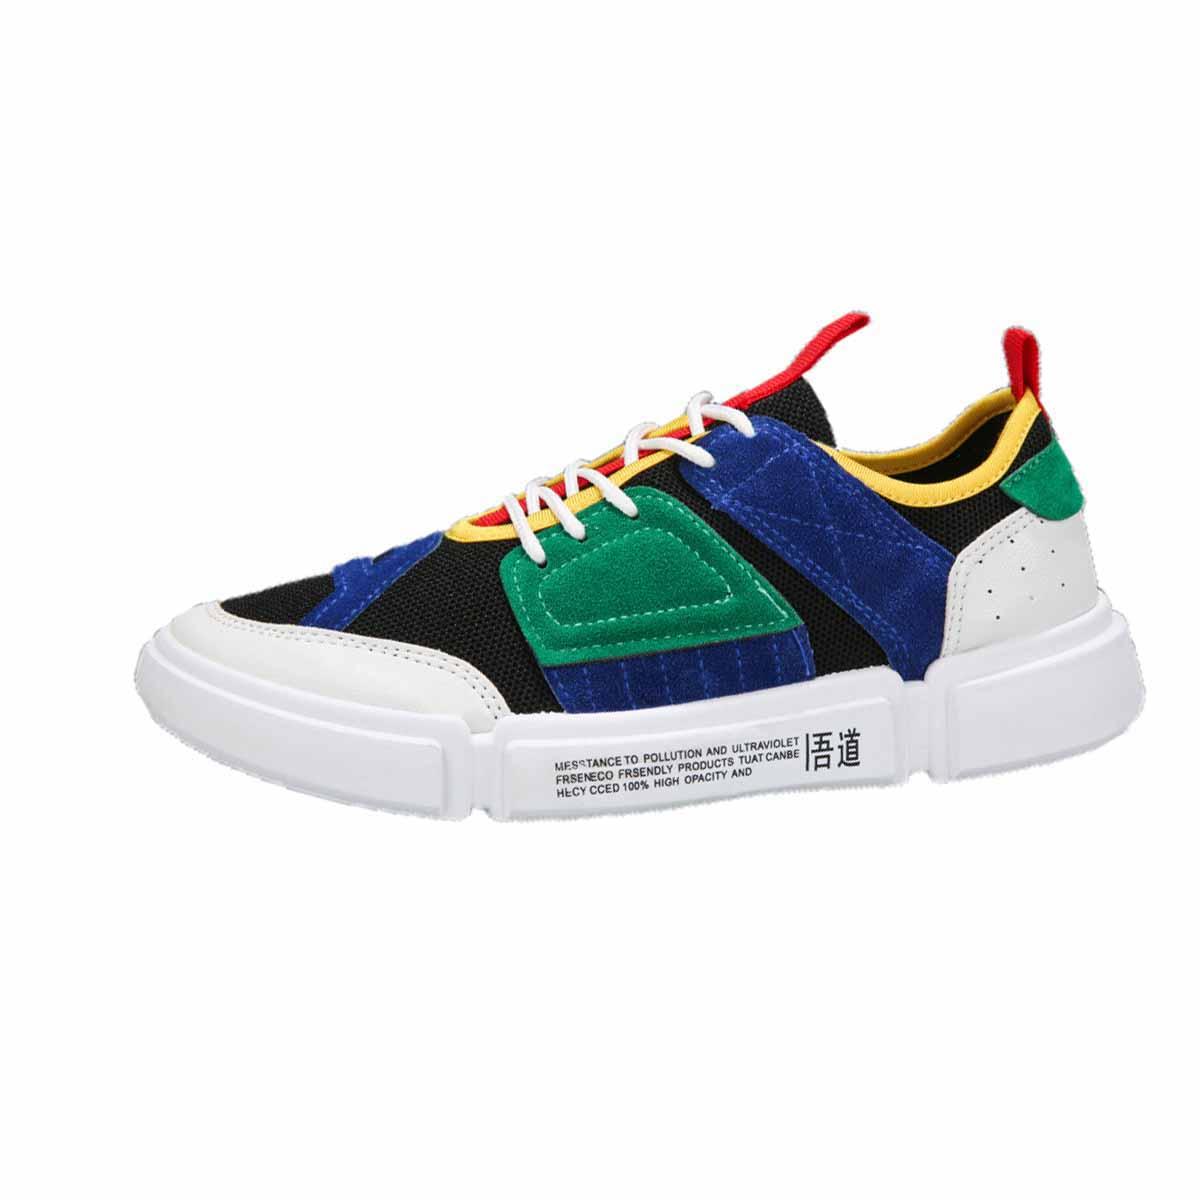 359be4d57 Zapatos bajos vulcanizados para hombre Goku zapatillas de deporte Punk  coloridas planas de alta calidad para hombre zapatillas de calle de Graffiti